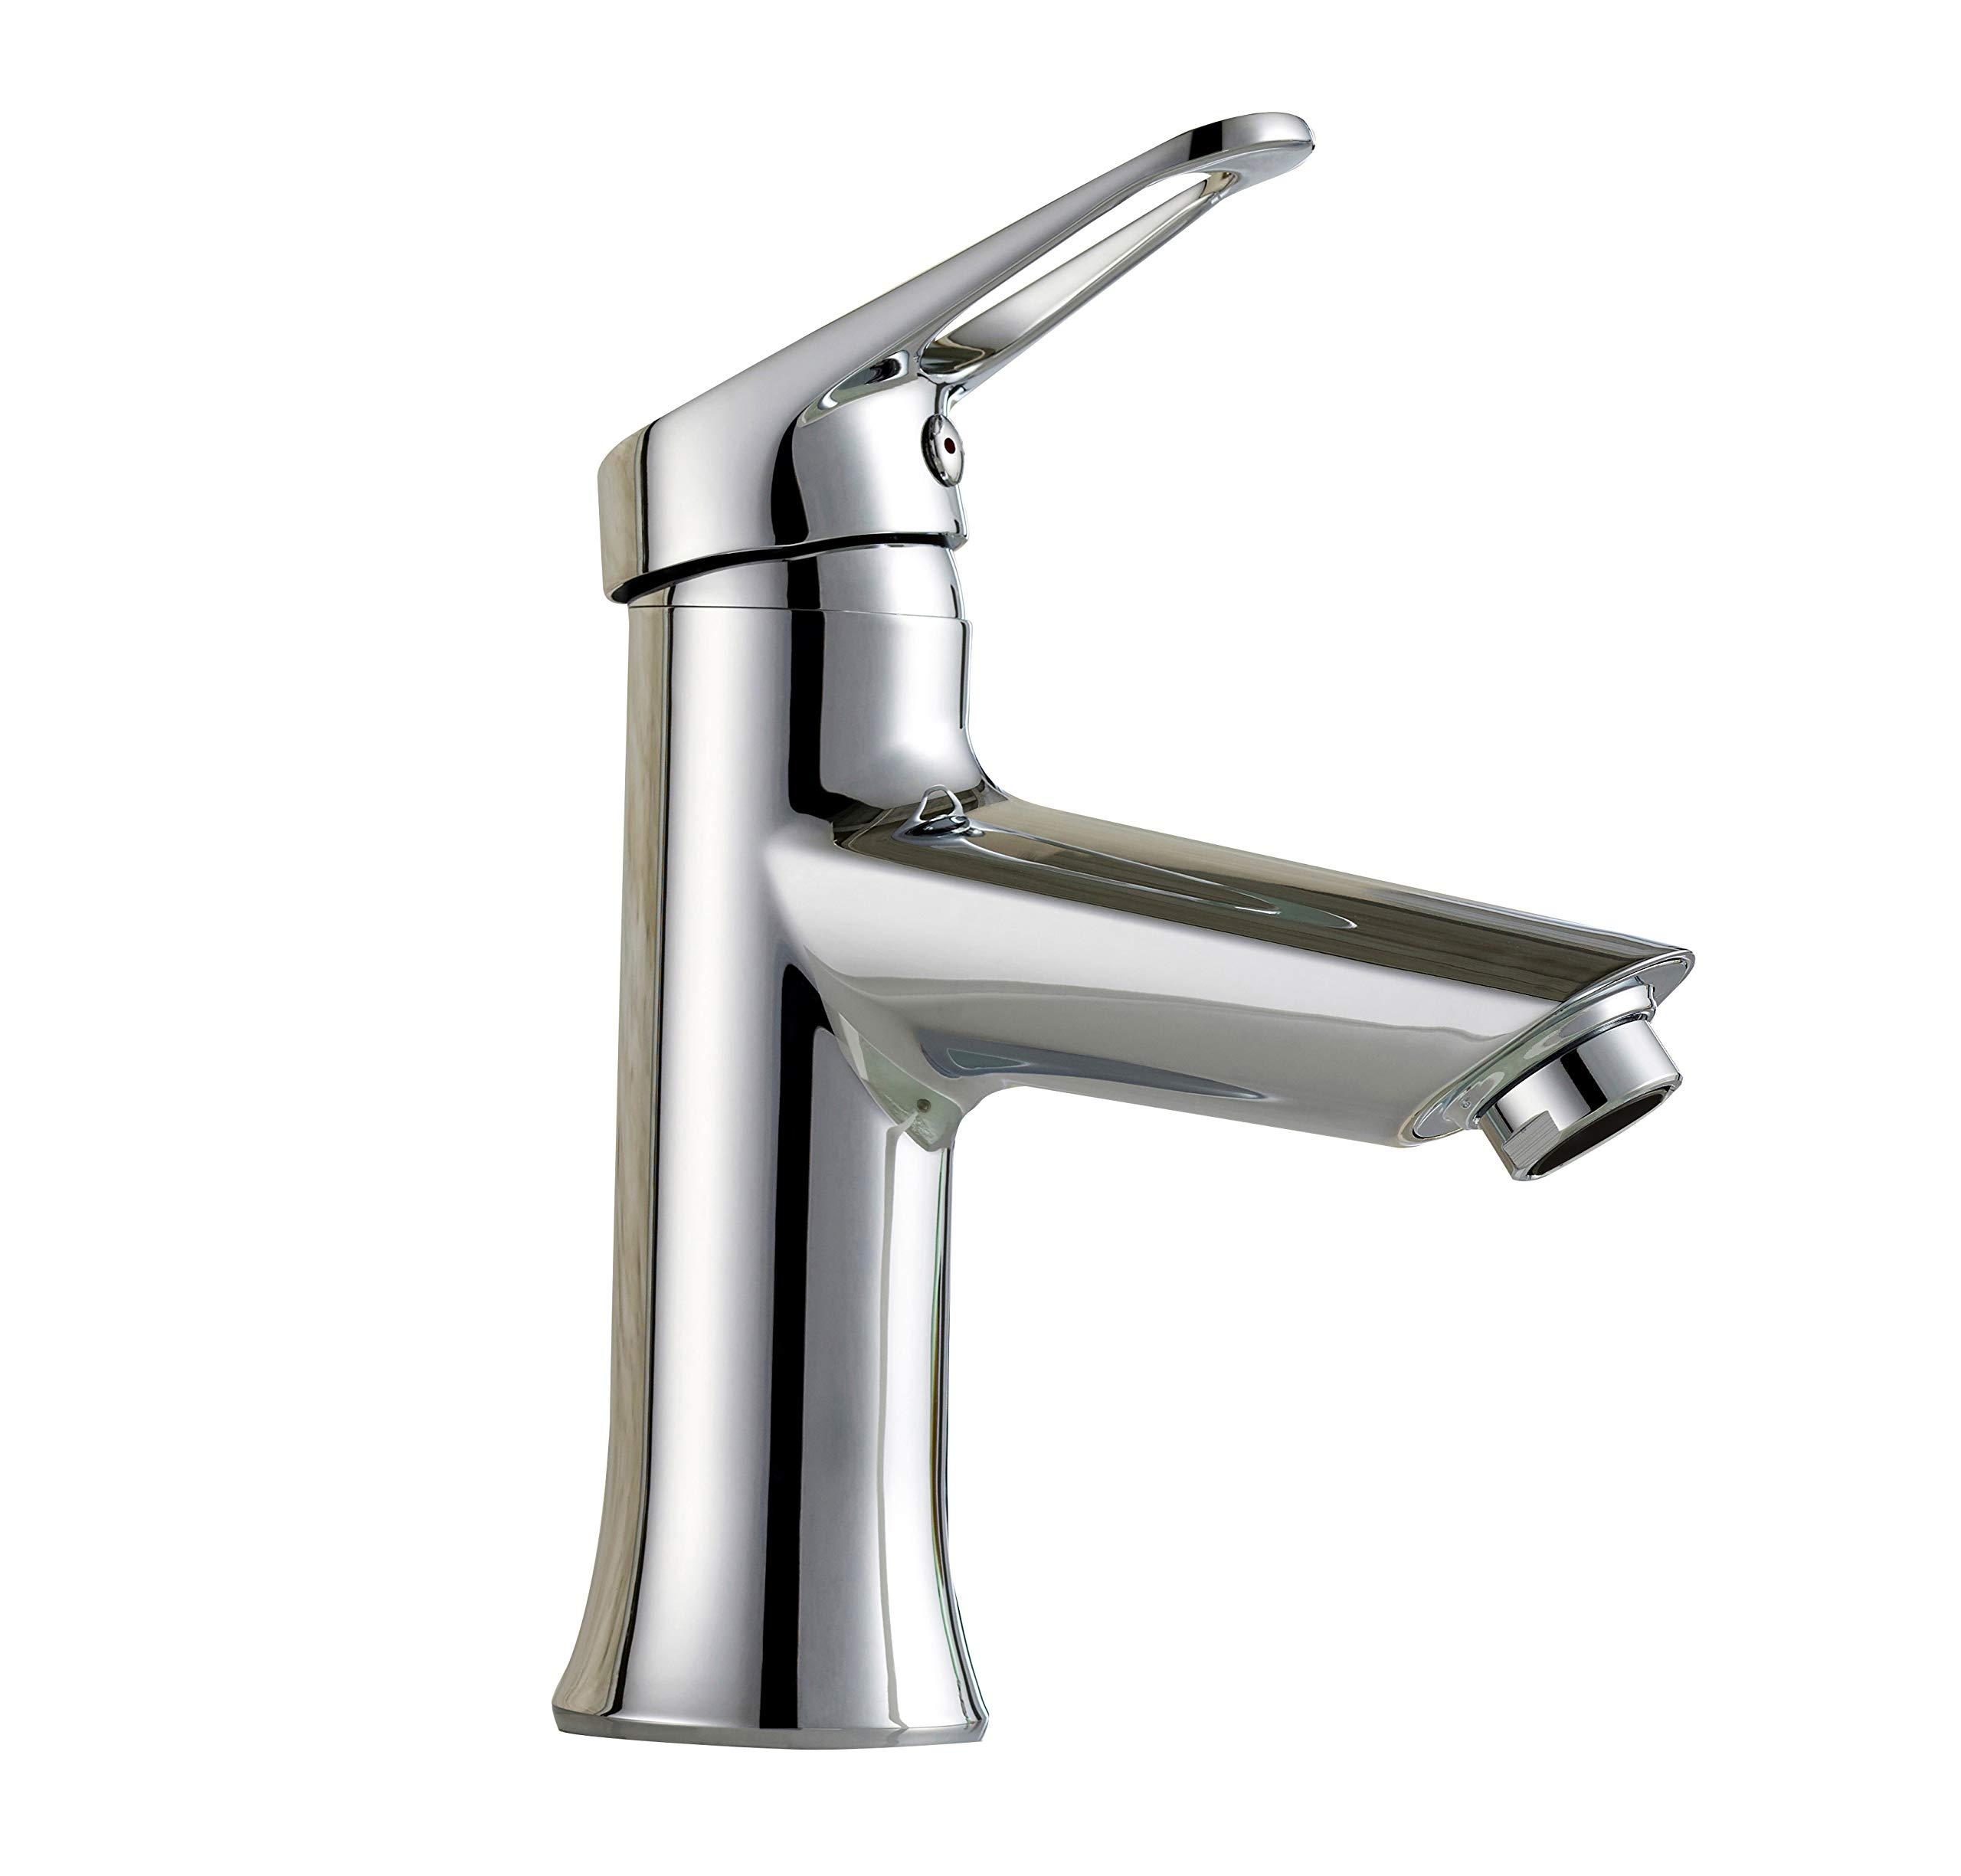 TimeArrow Single Handle Bathroom Sink Faucet With Stainless Steel Braided Hose, Chrome by TimeArrow